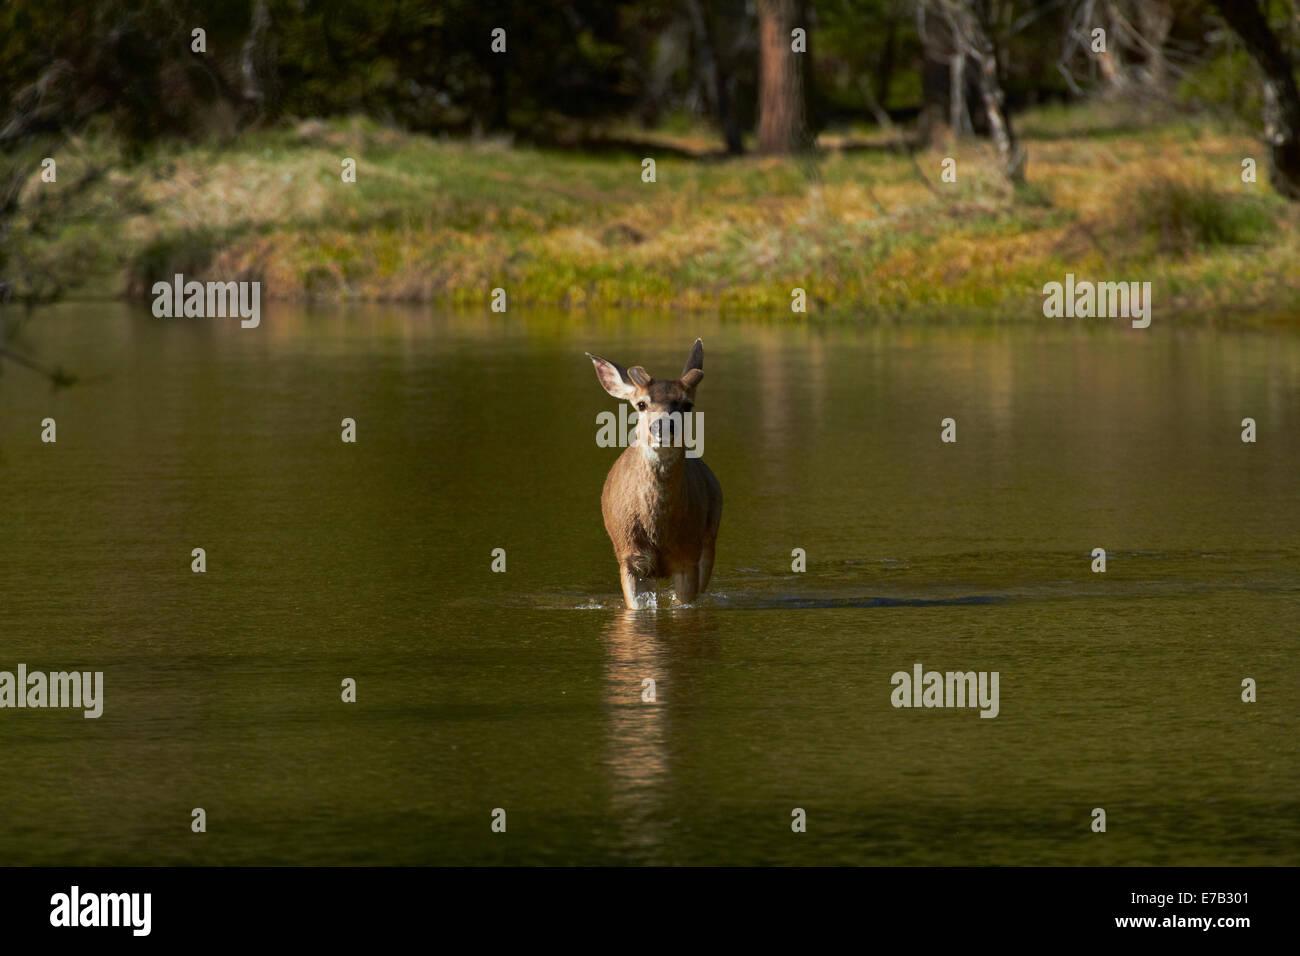 Mule deer (Odocoileus hemionus) by Mirror Lake, Tenaya Canyon, Yosemite National Park, California, USA - Stock Image